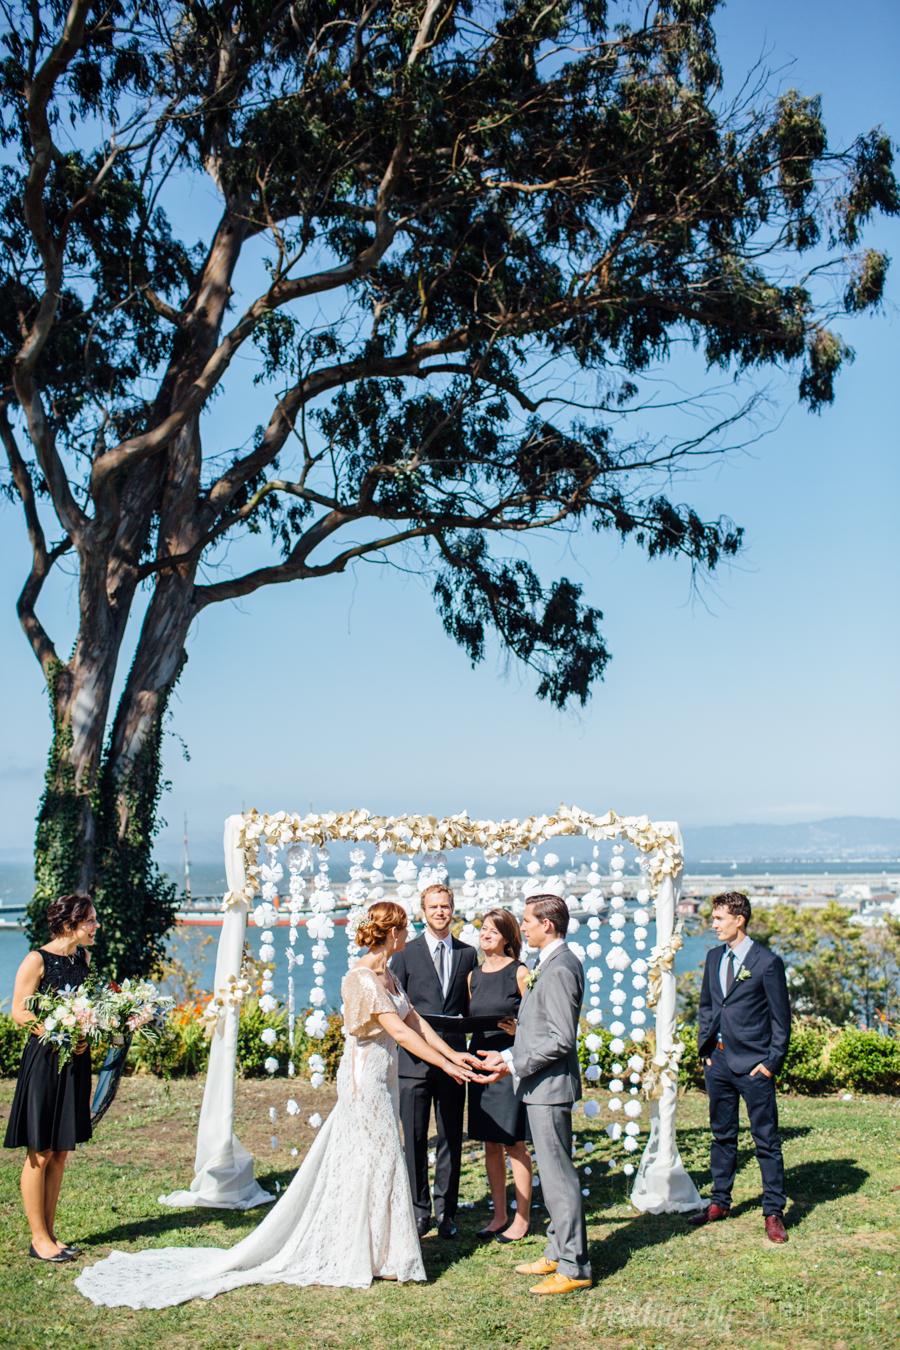 photo by Weddings by Sunnyside